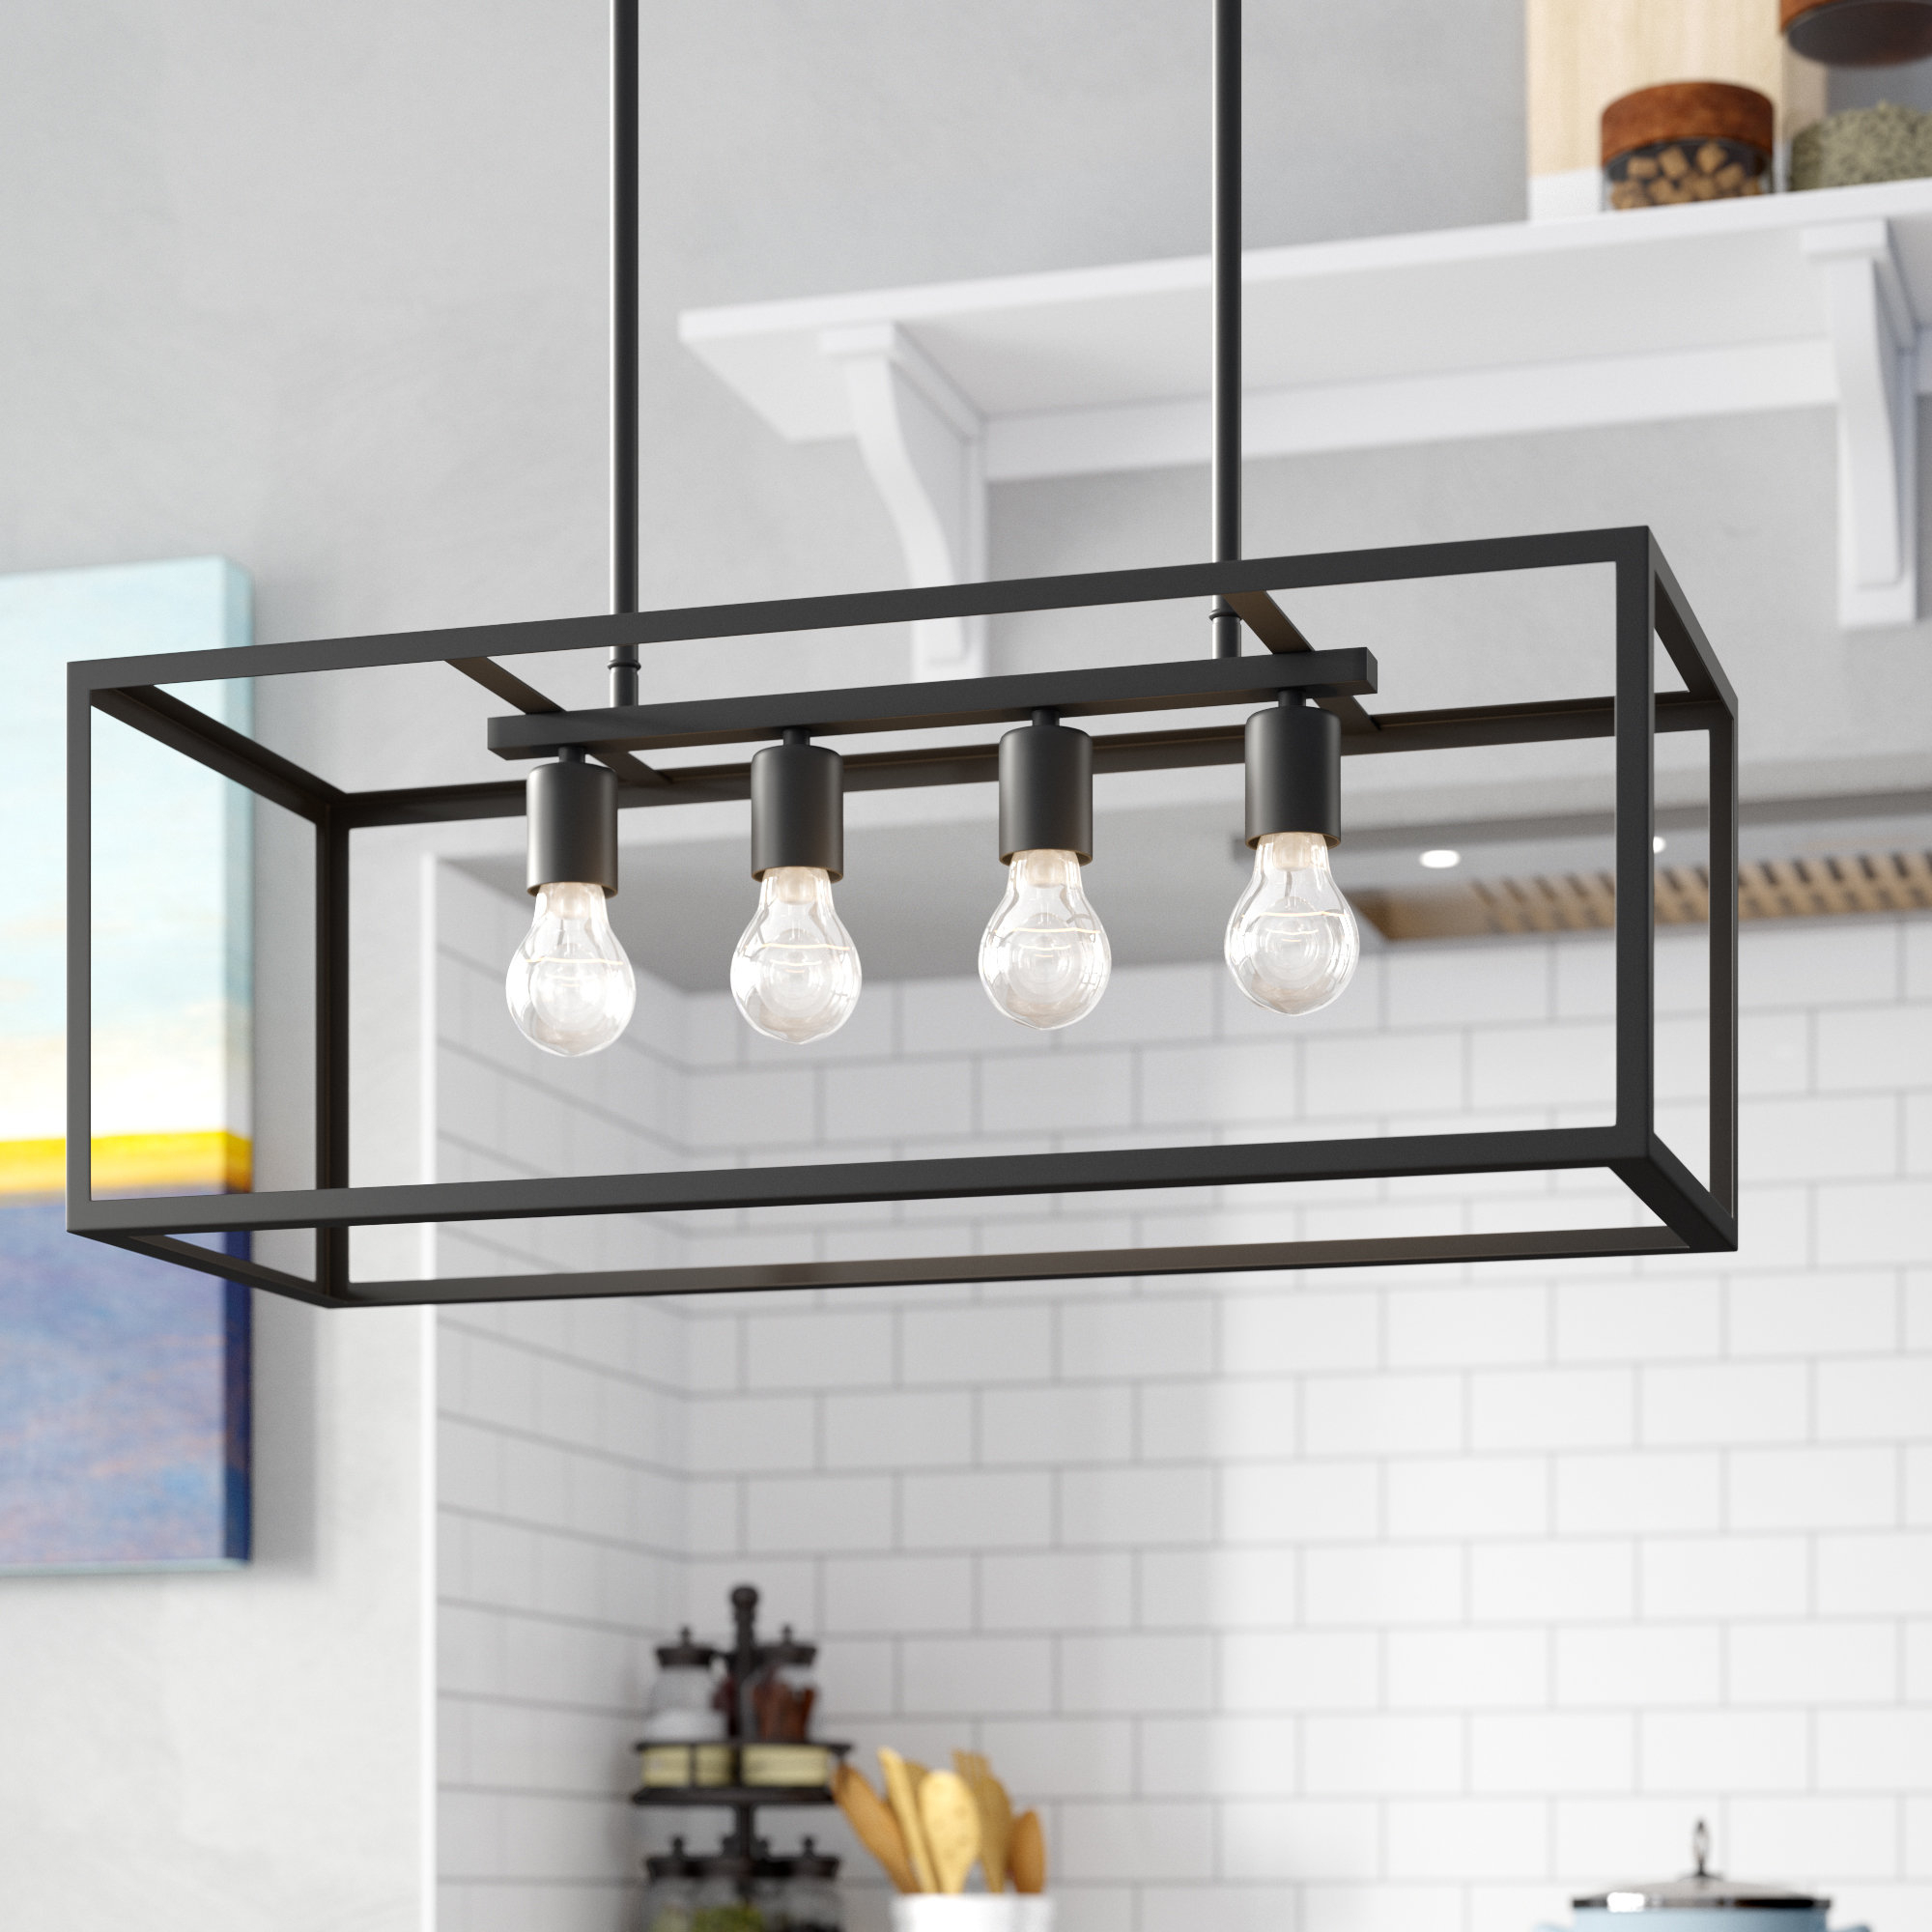 Jefferson 4 Light Kitchen Island Linear Pendants Regarding 2019 Ratner 4 Light Kitchen Island Linear Pendant (View 4 of 20)